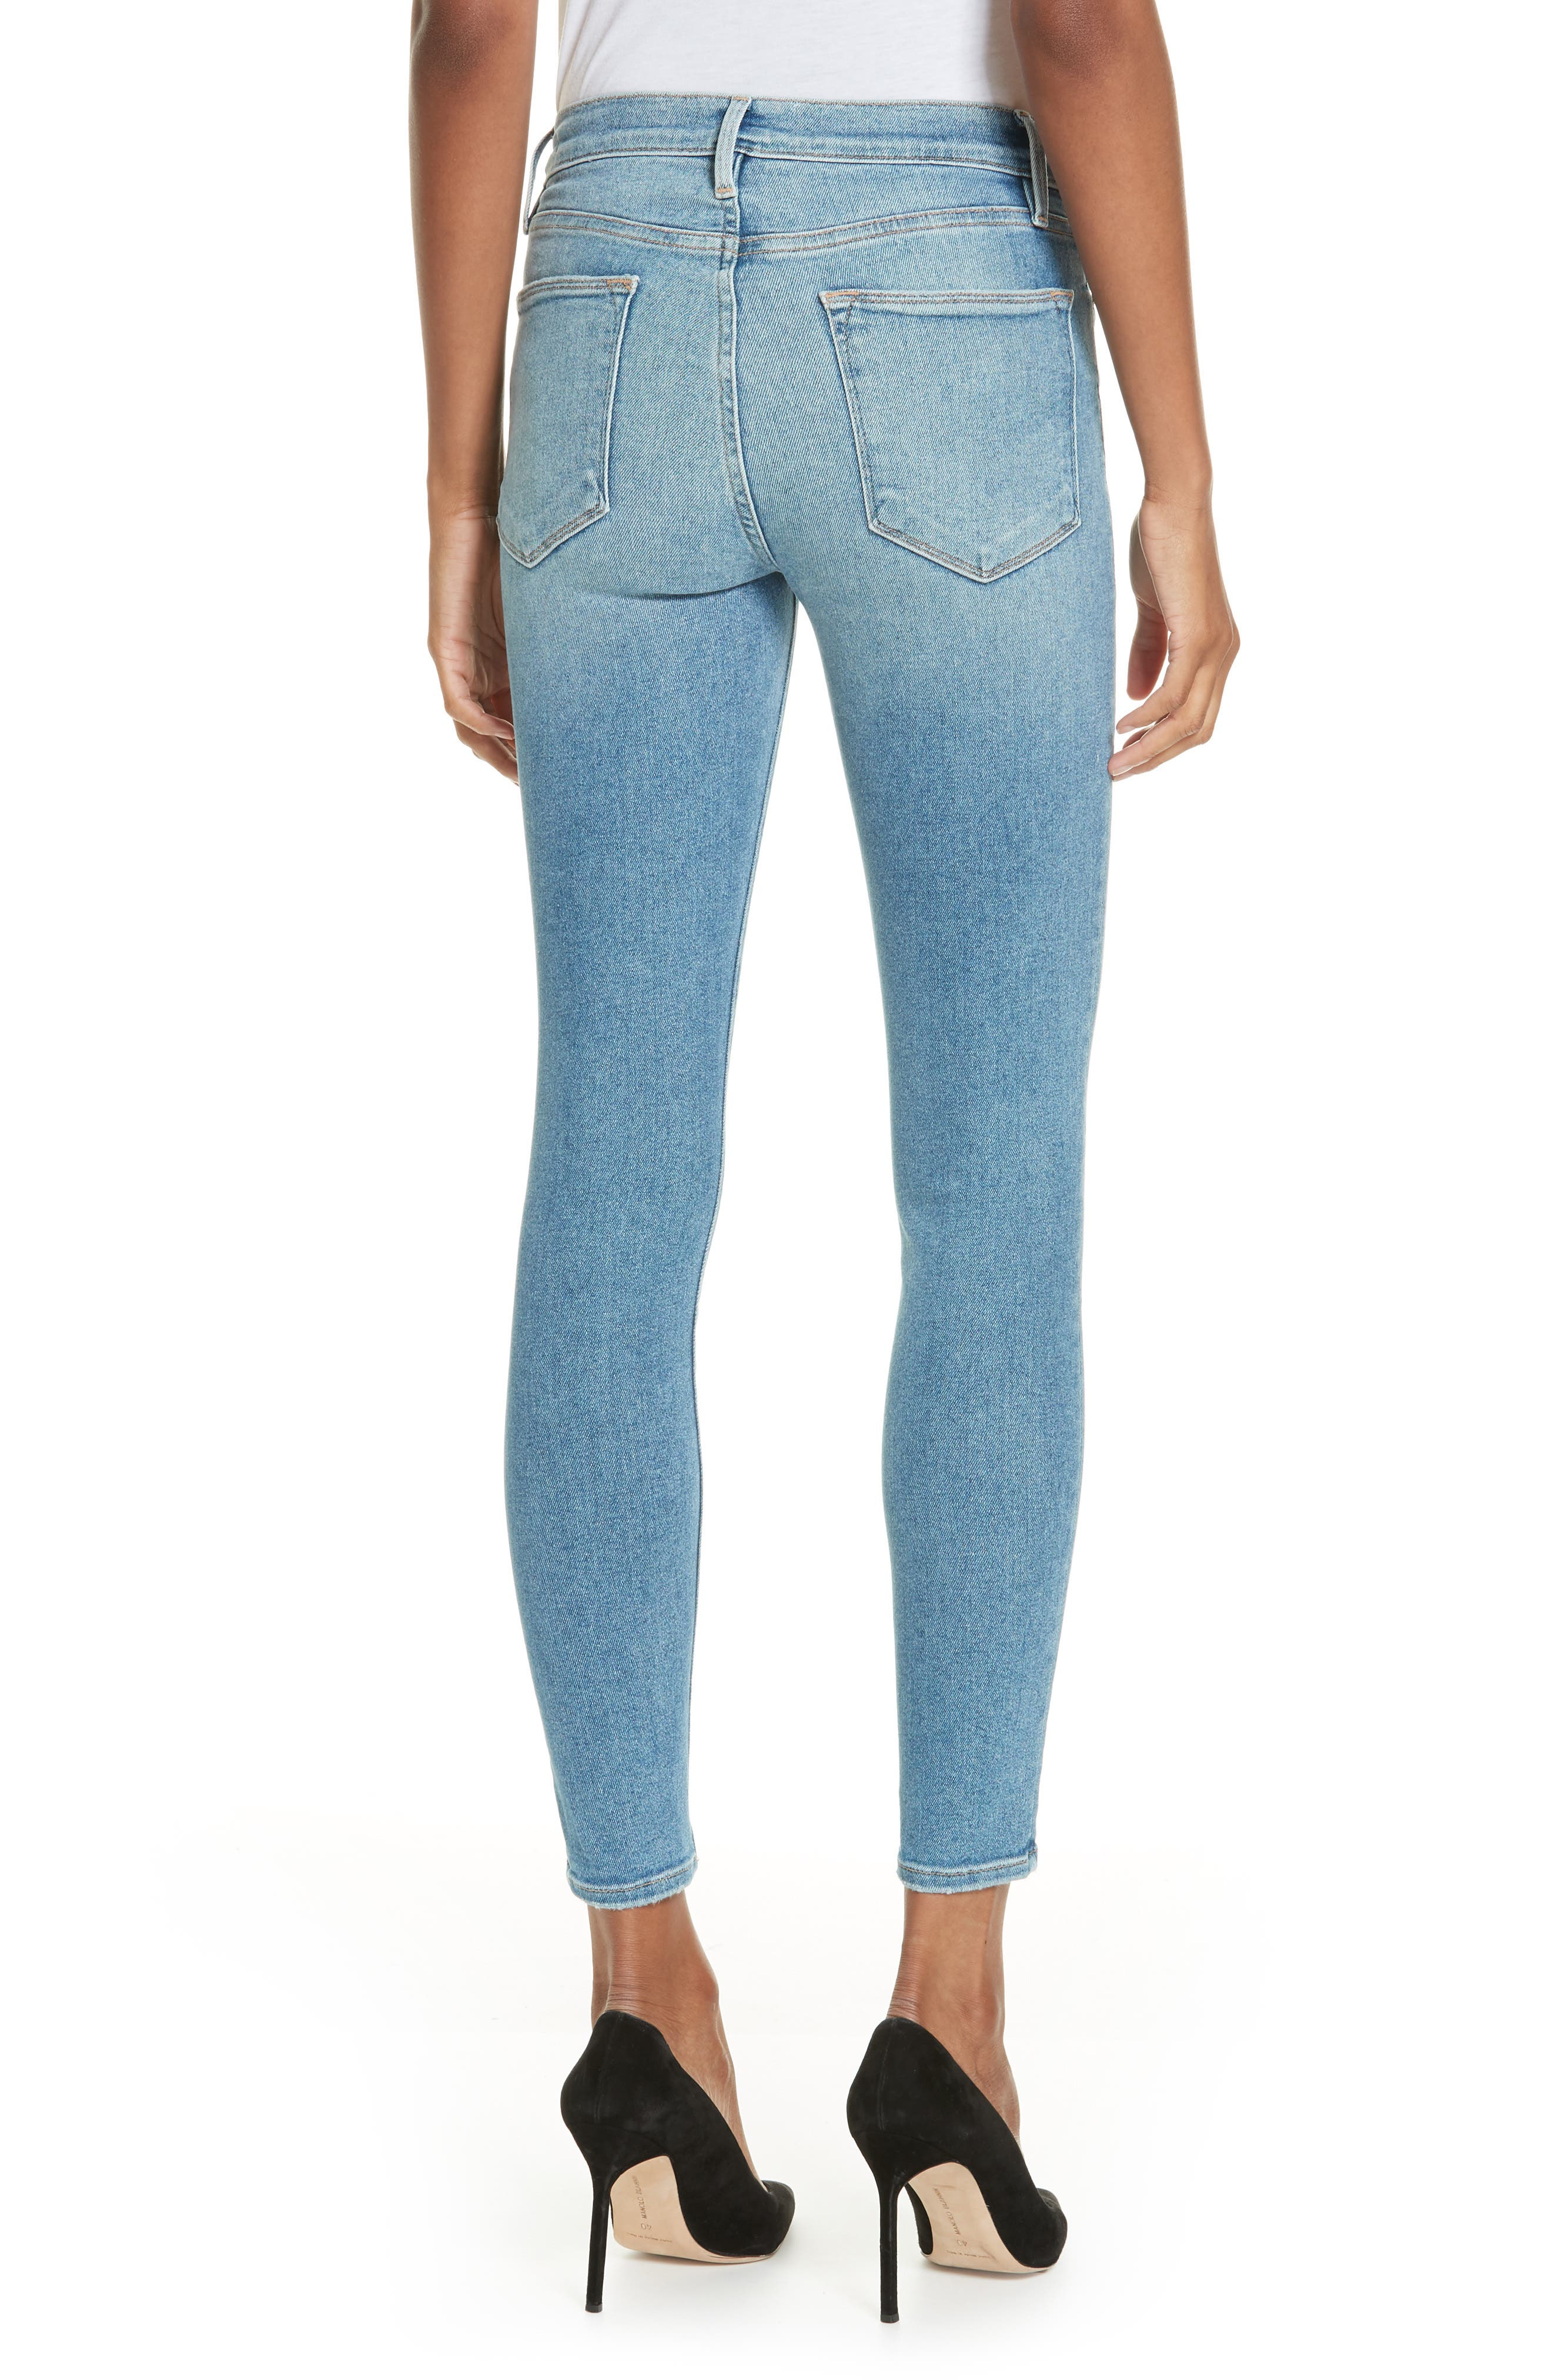 Le High Skinny Jeans,                             Alternate thumbnail 2, color,                             DUPONT DRIVE